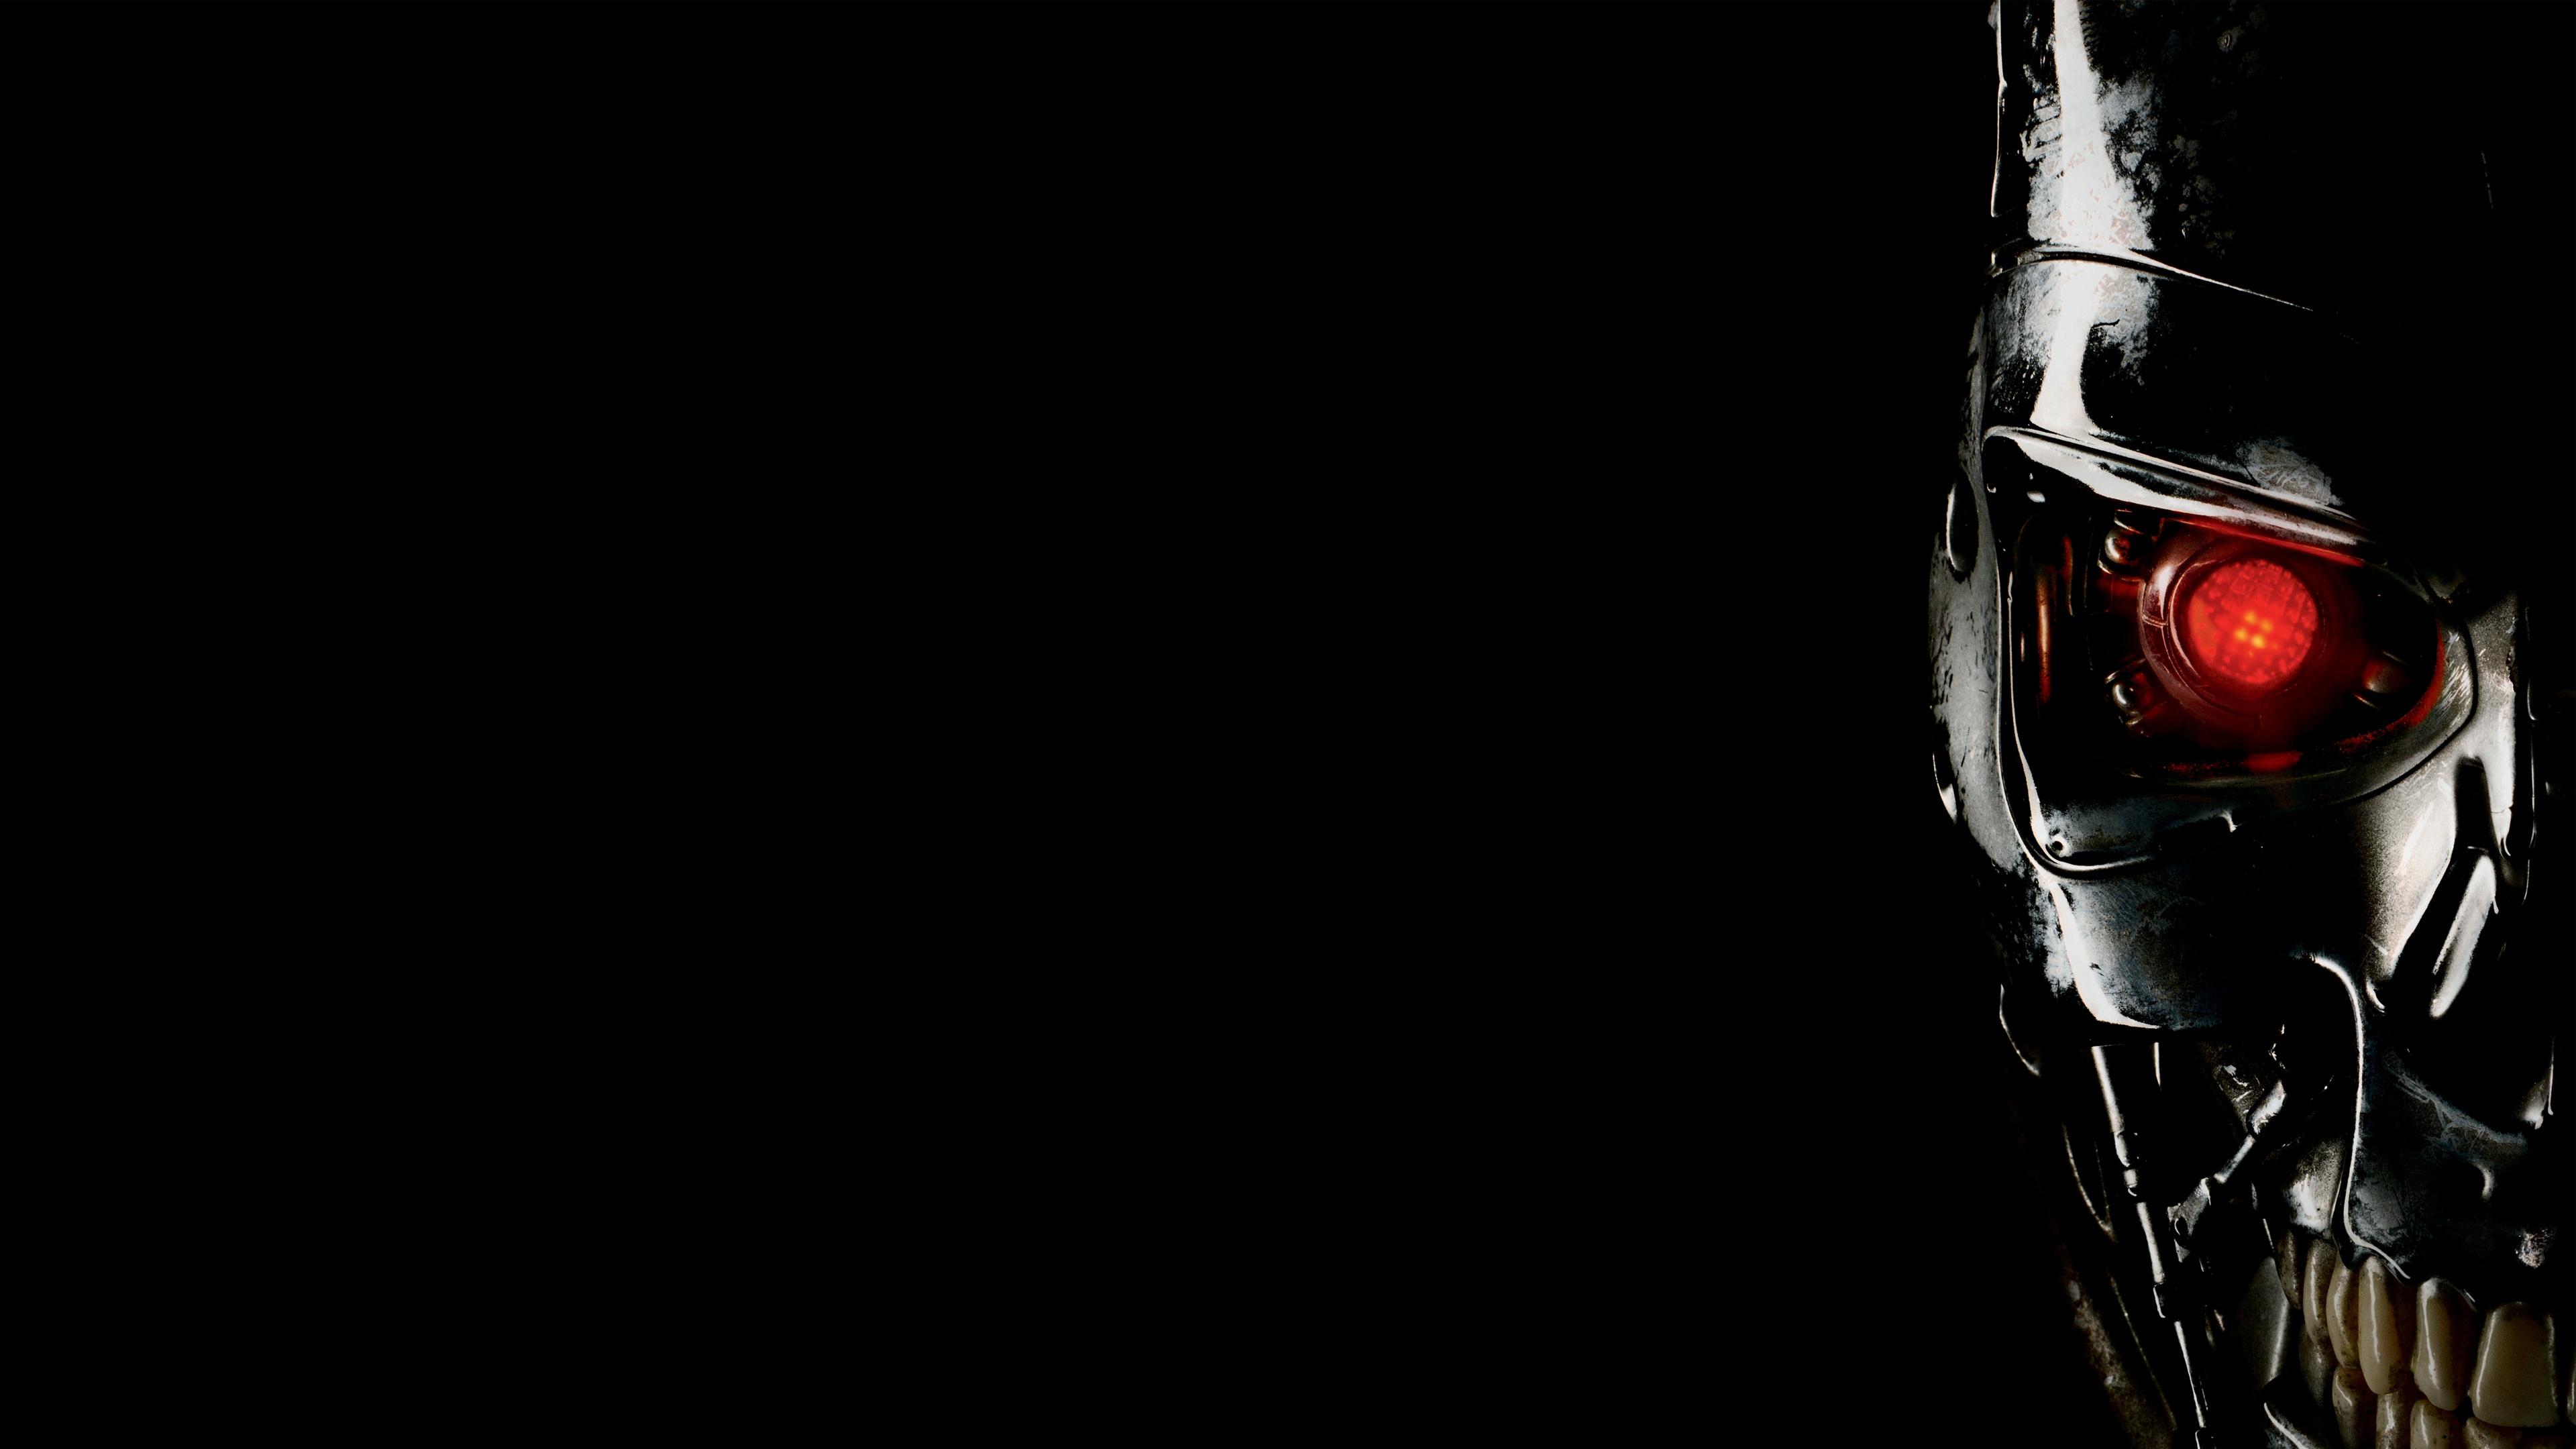 Terminator genisys 4k ultra hd wallpaper background image 3840x2160 id 601841 wallpaper - Terminator 2 wallpaper hd ...